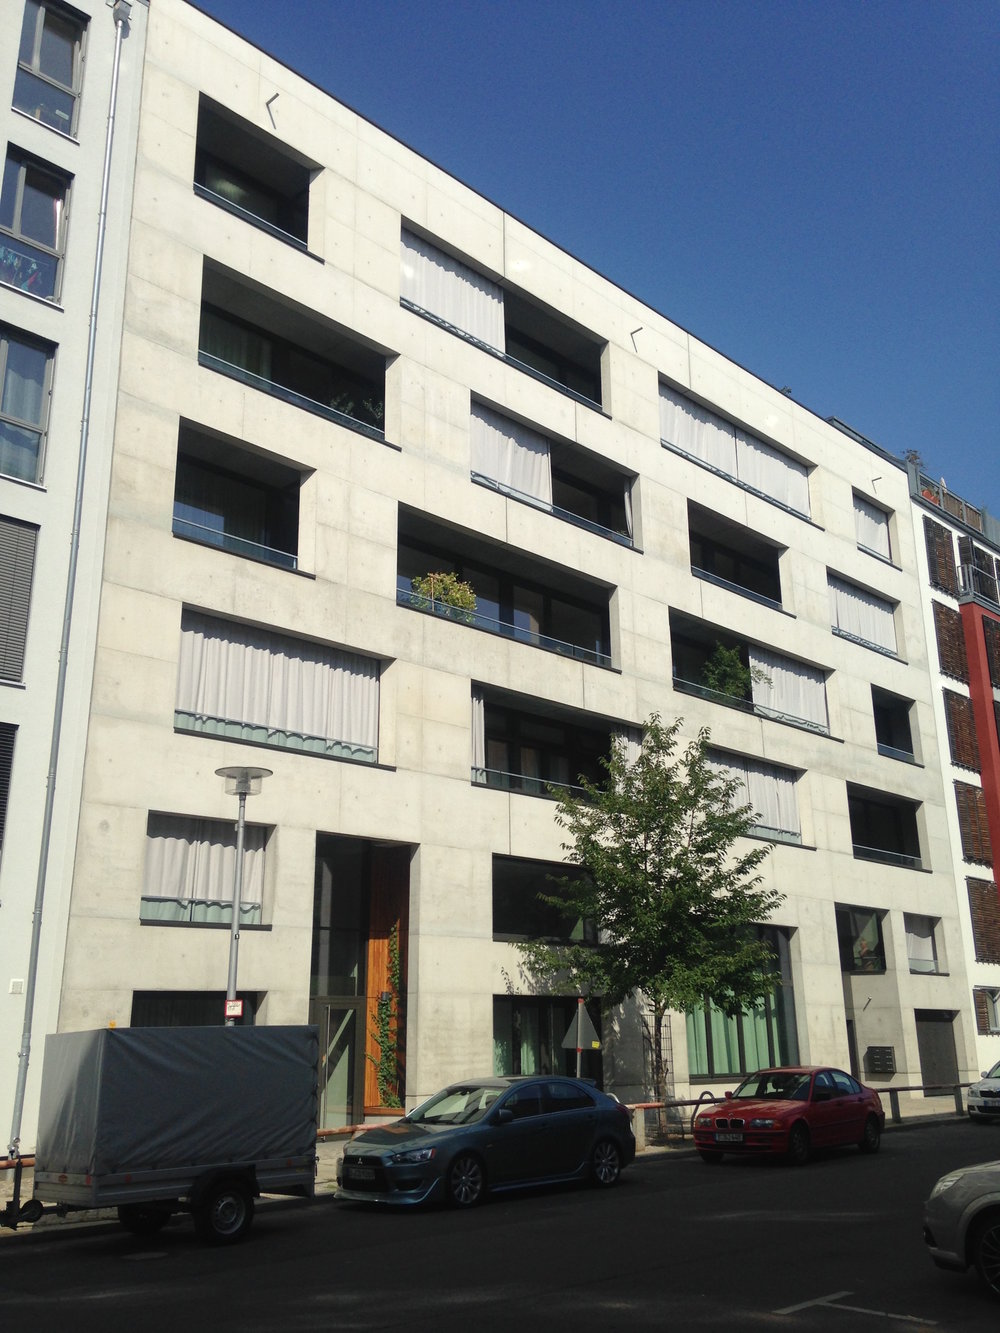 Berlin-Street-3.jpg